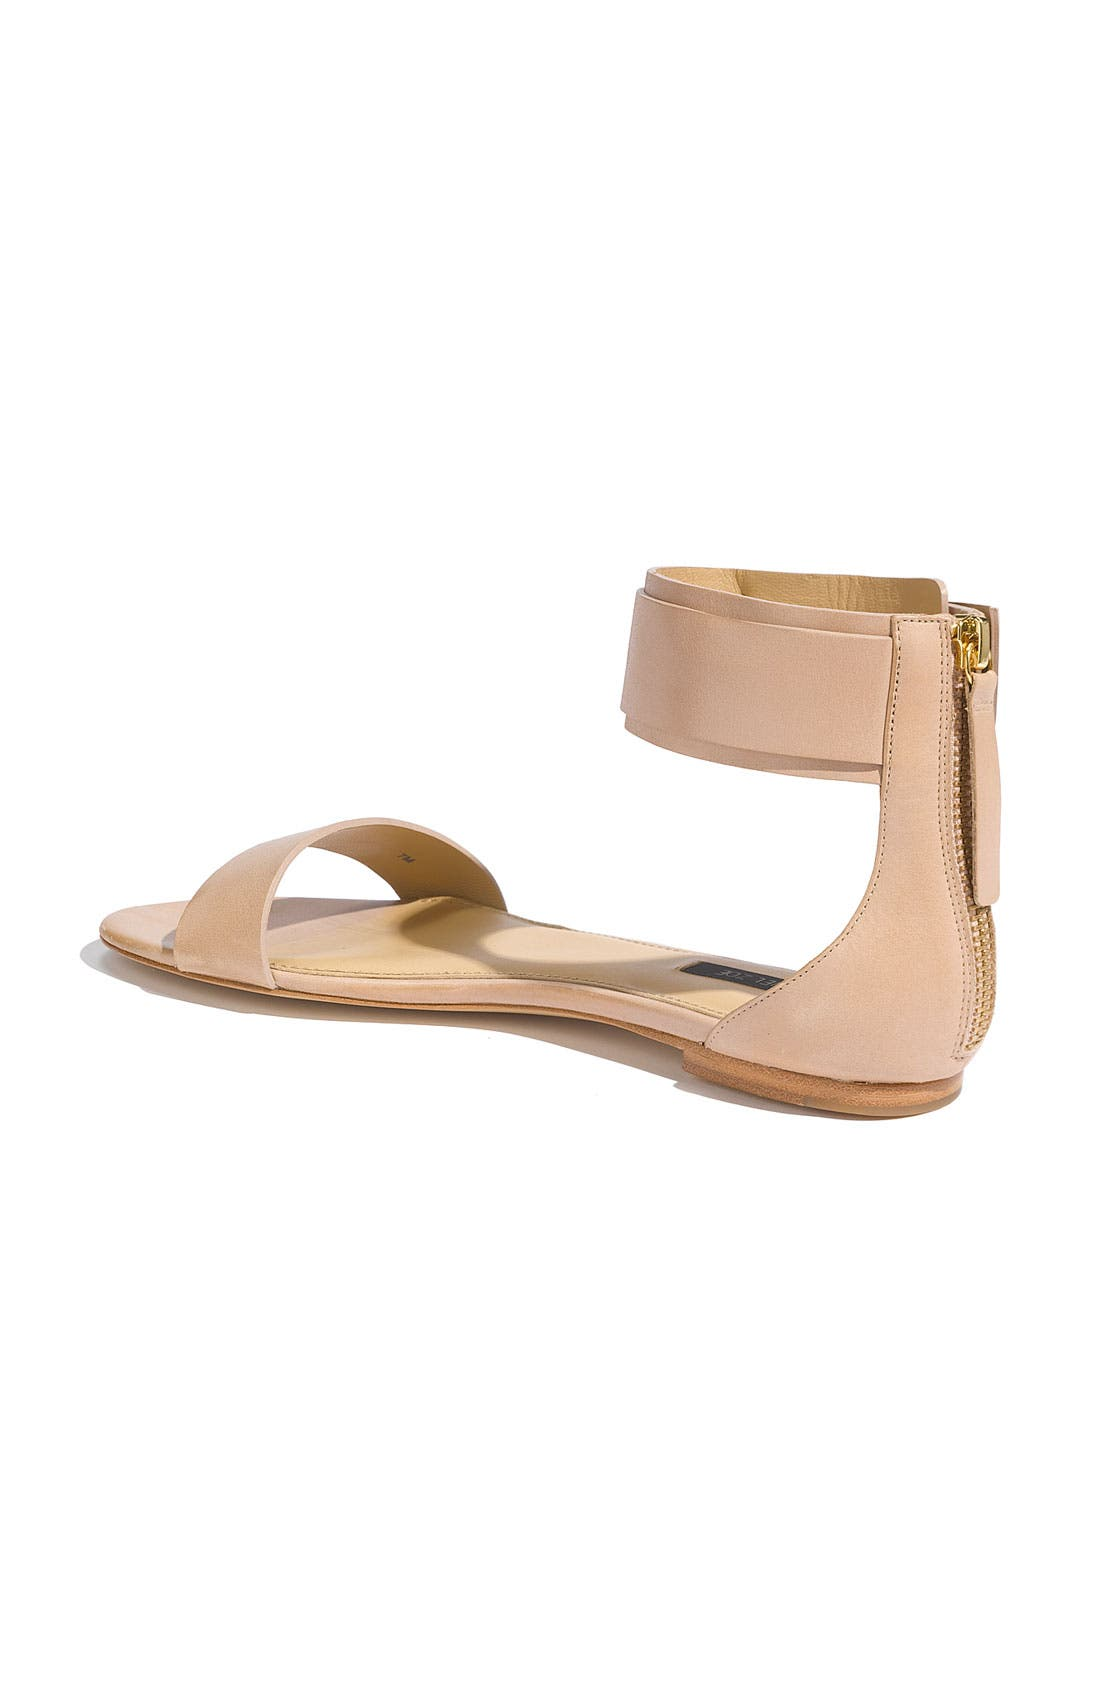 Alternate Image 2  - Rachel Zoe 'Gladys' Flat Sandal